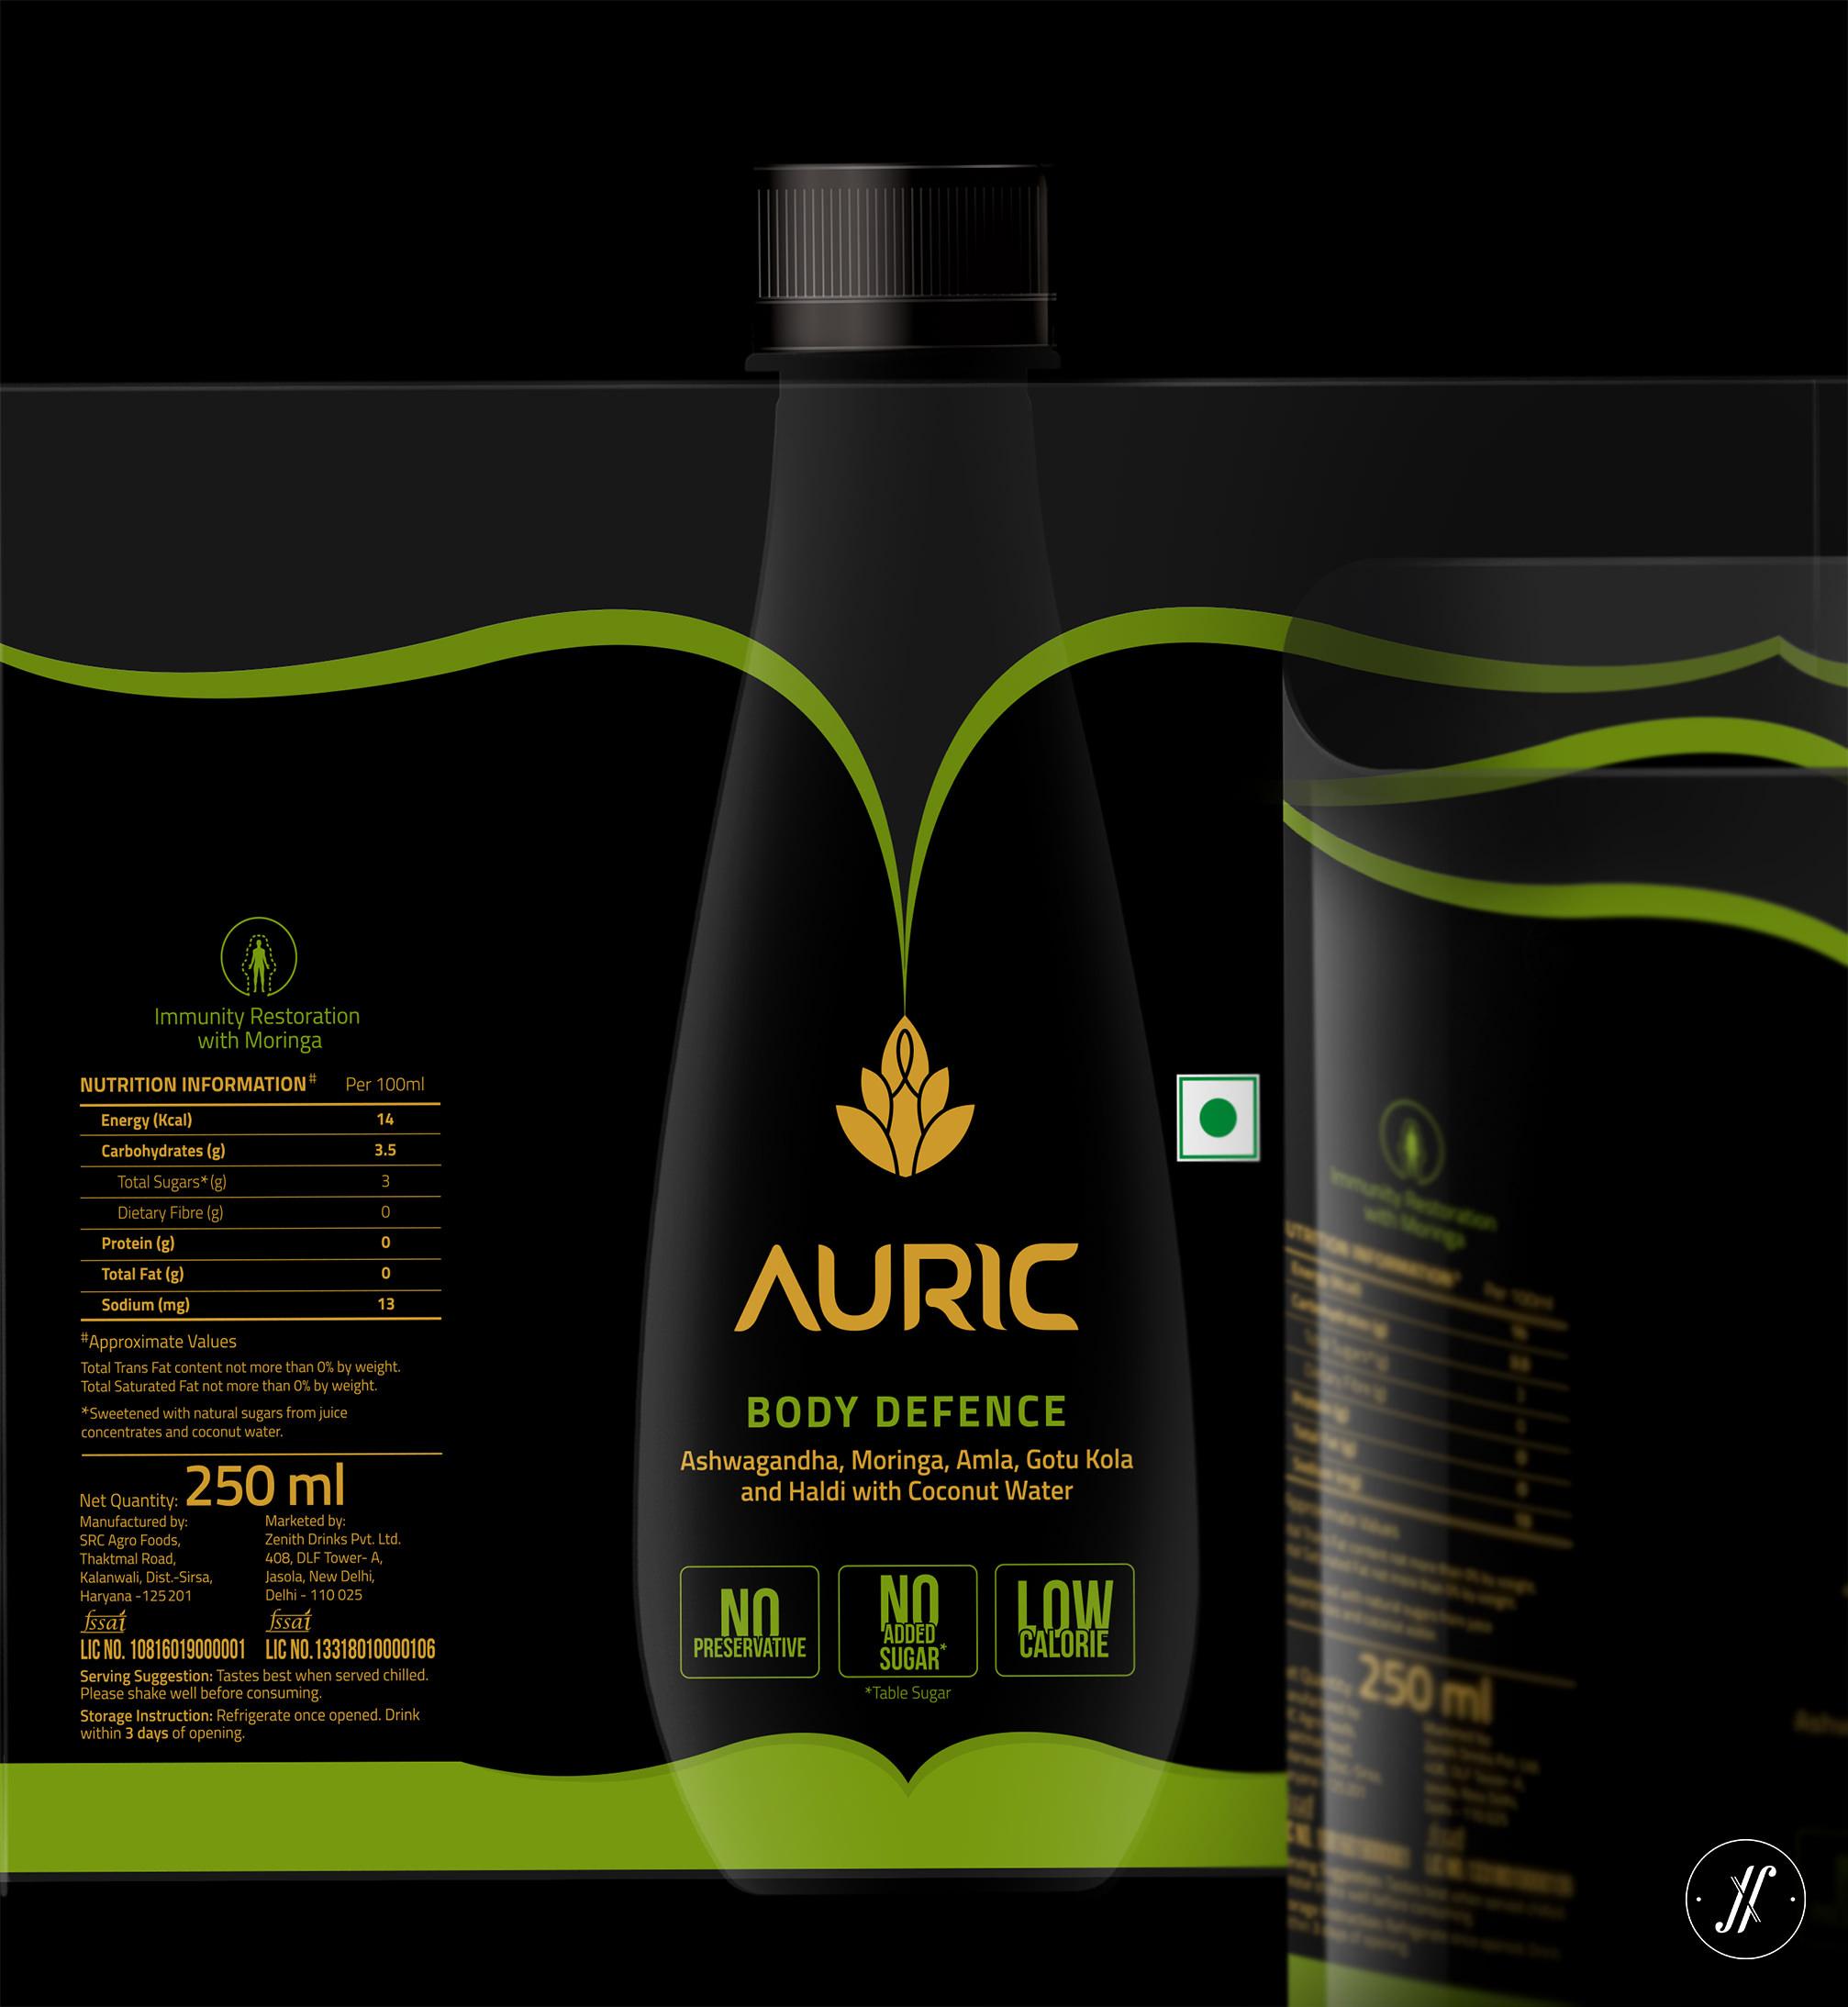 Yellow Fishes Branding Agency Mumbai Best creative branding strategy and brand design agency mumbai Auric packaging design agency india